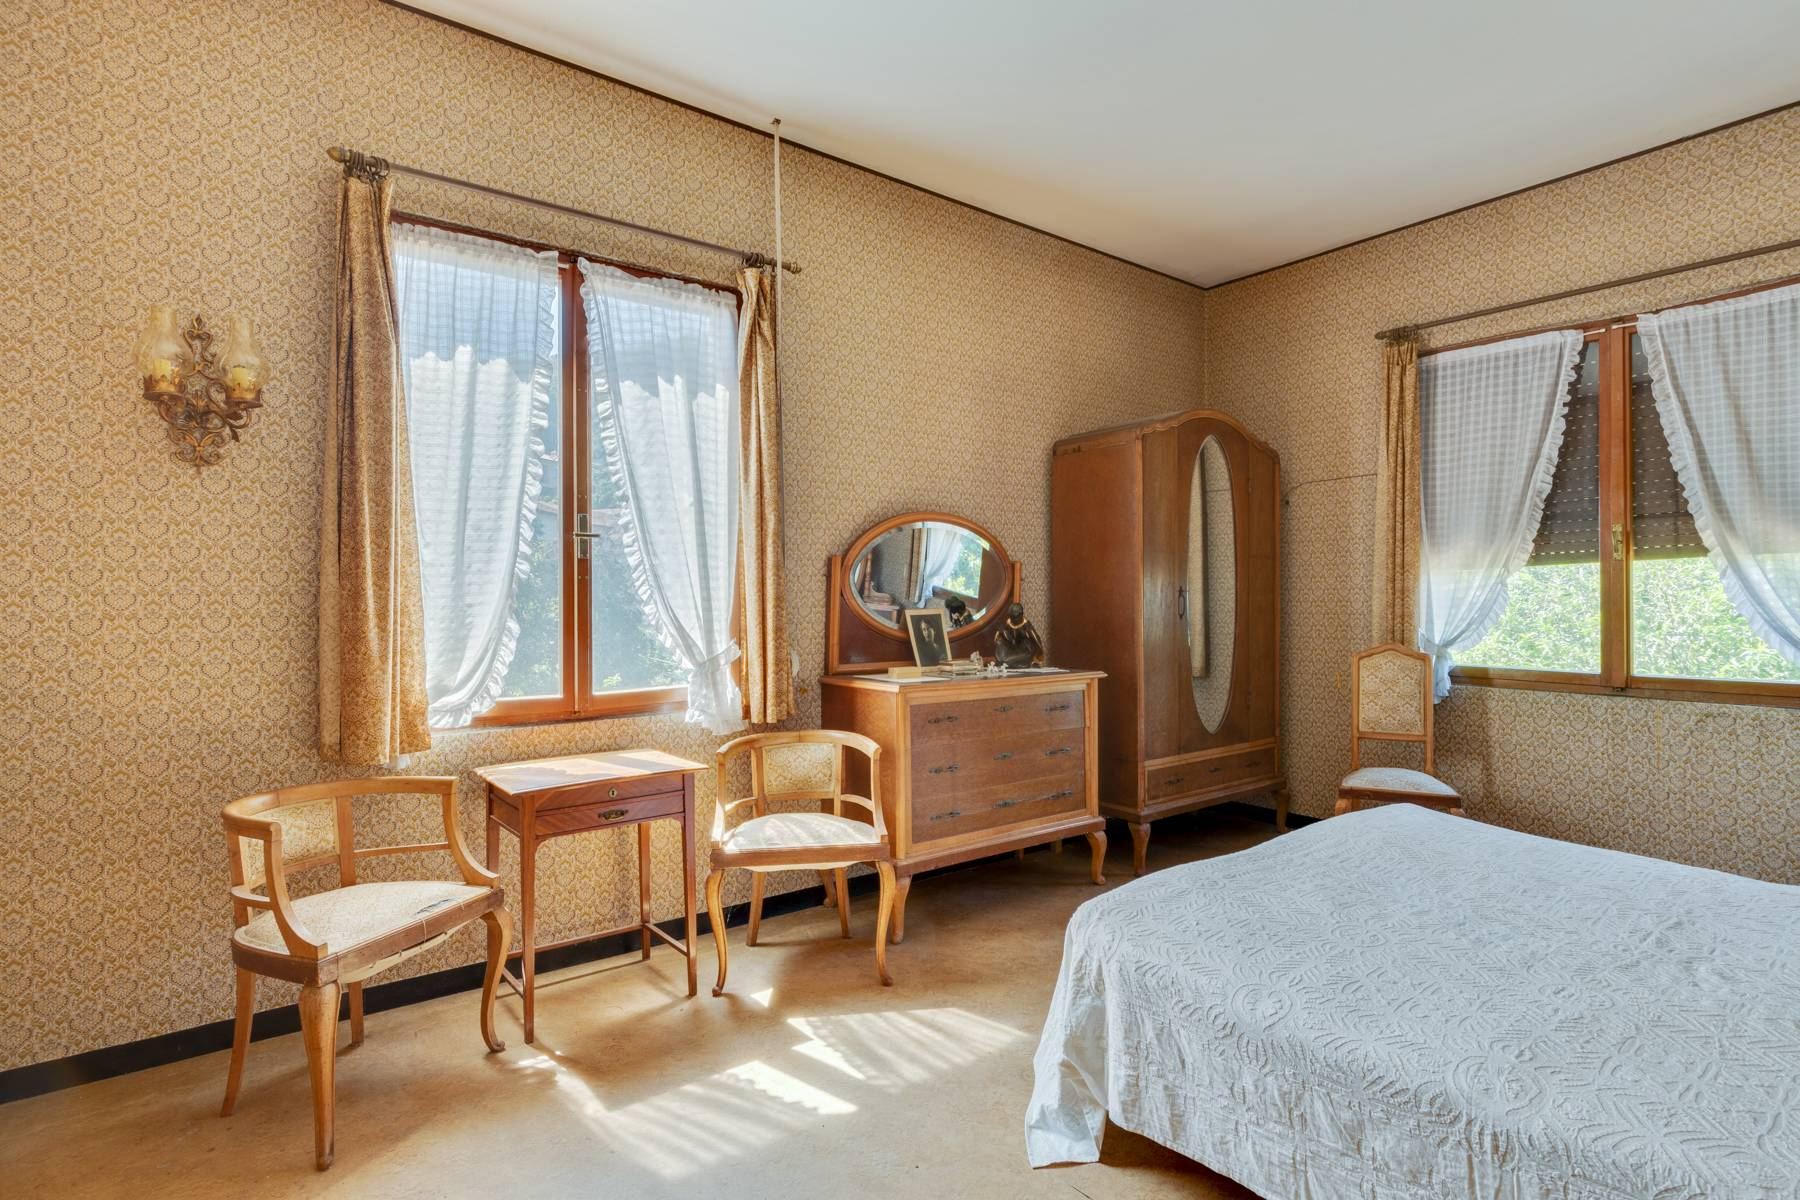 Villa in Vendita a Stresa: 5 locali, 150 mq - Foto 17